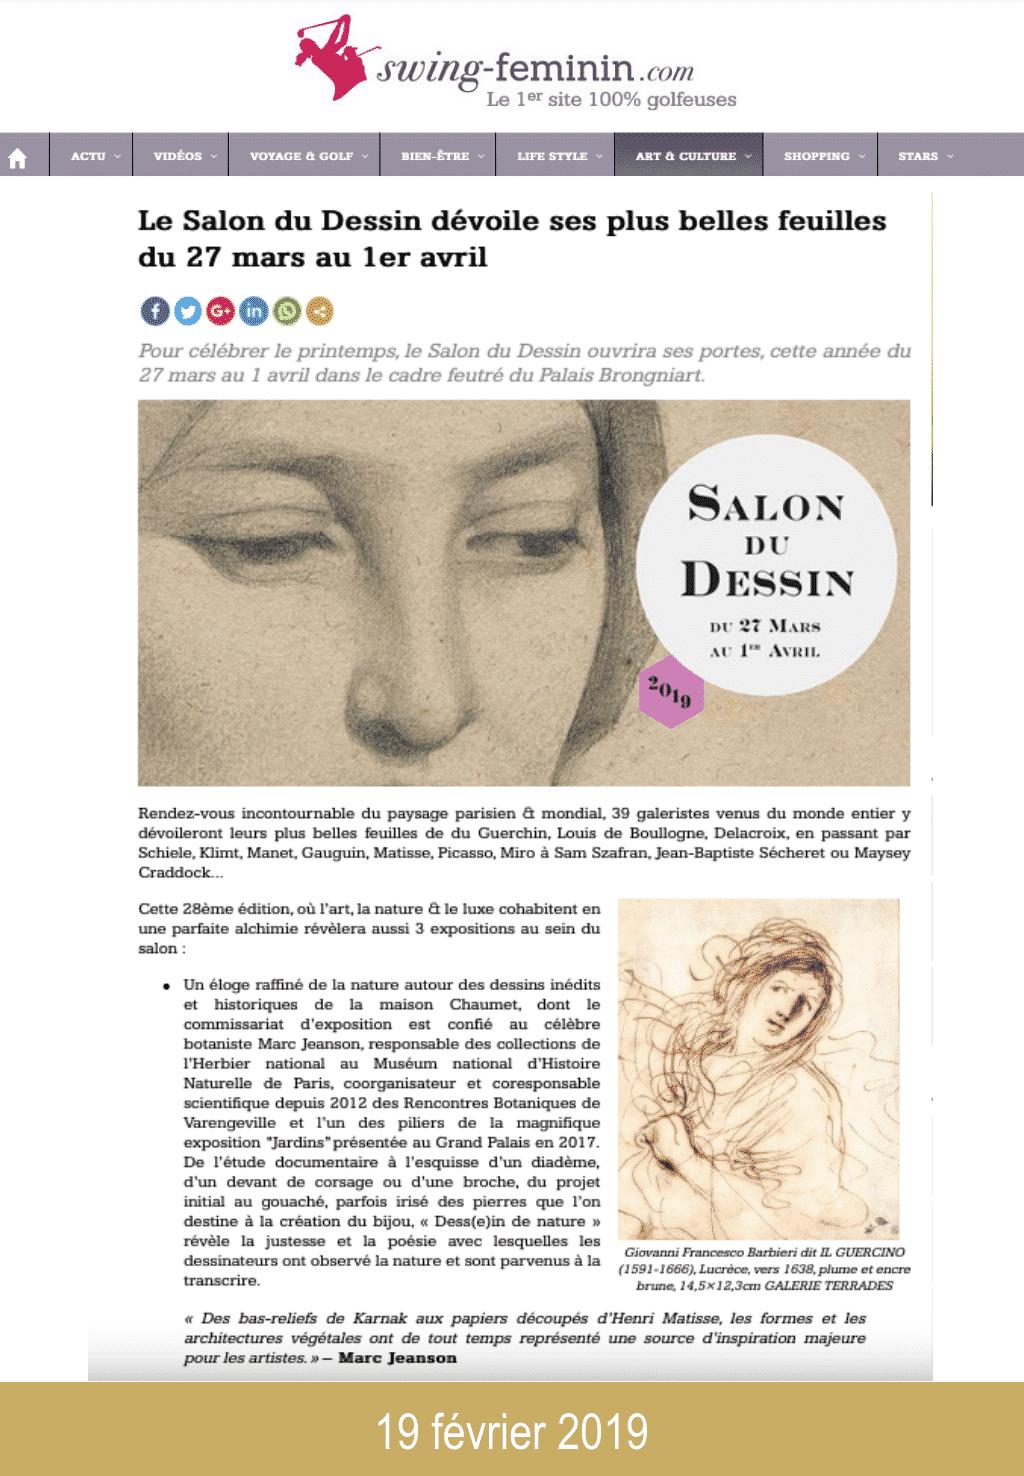 Presse salon du dessin 2019 swing-feminin.com